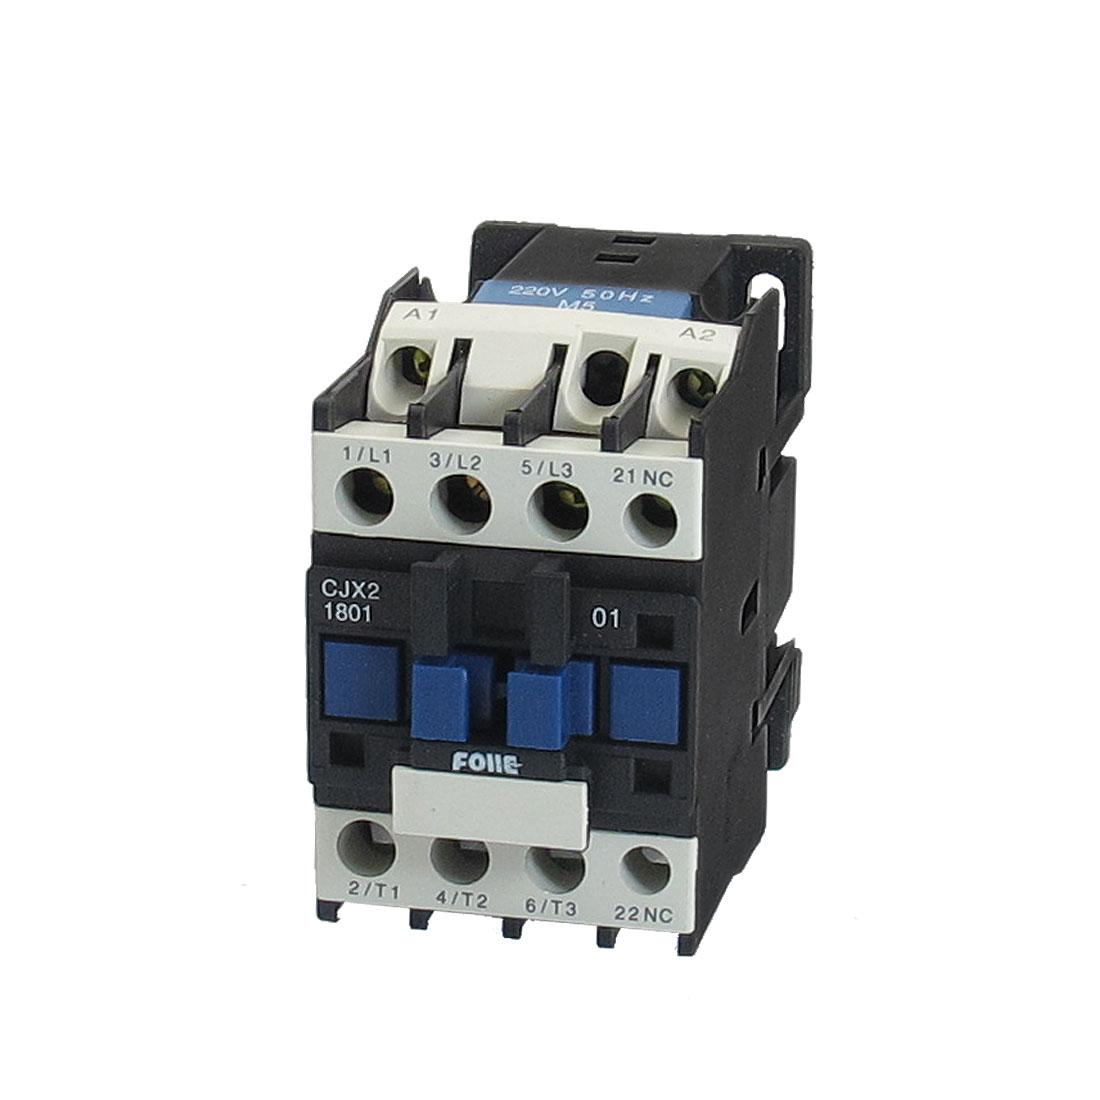 CJX2-1810 380V 18A 220V Coil 3 Pole 3P NC DIN Rail AC Contactor